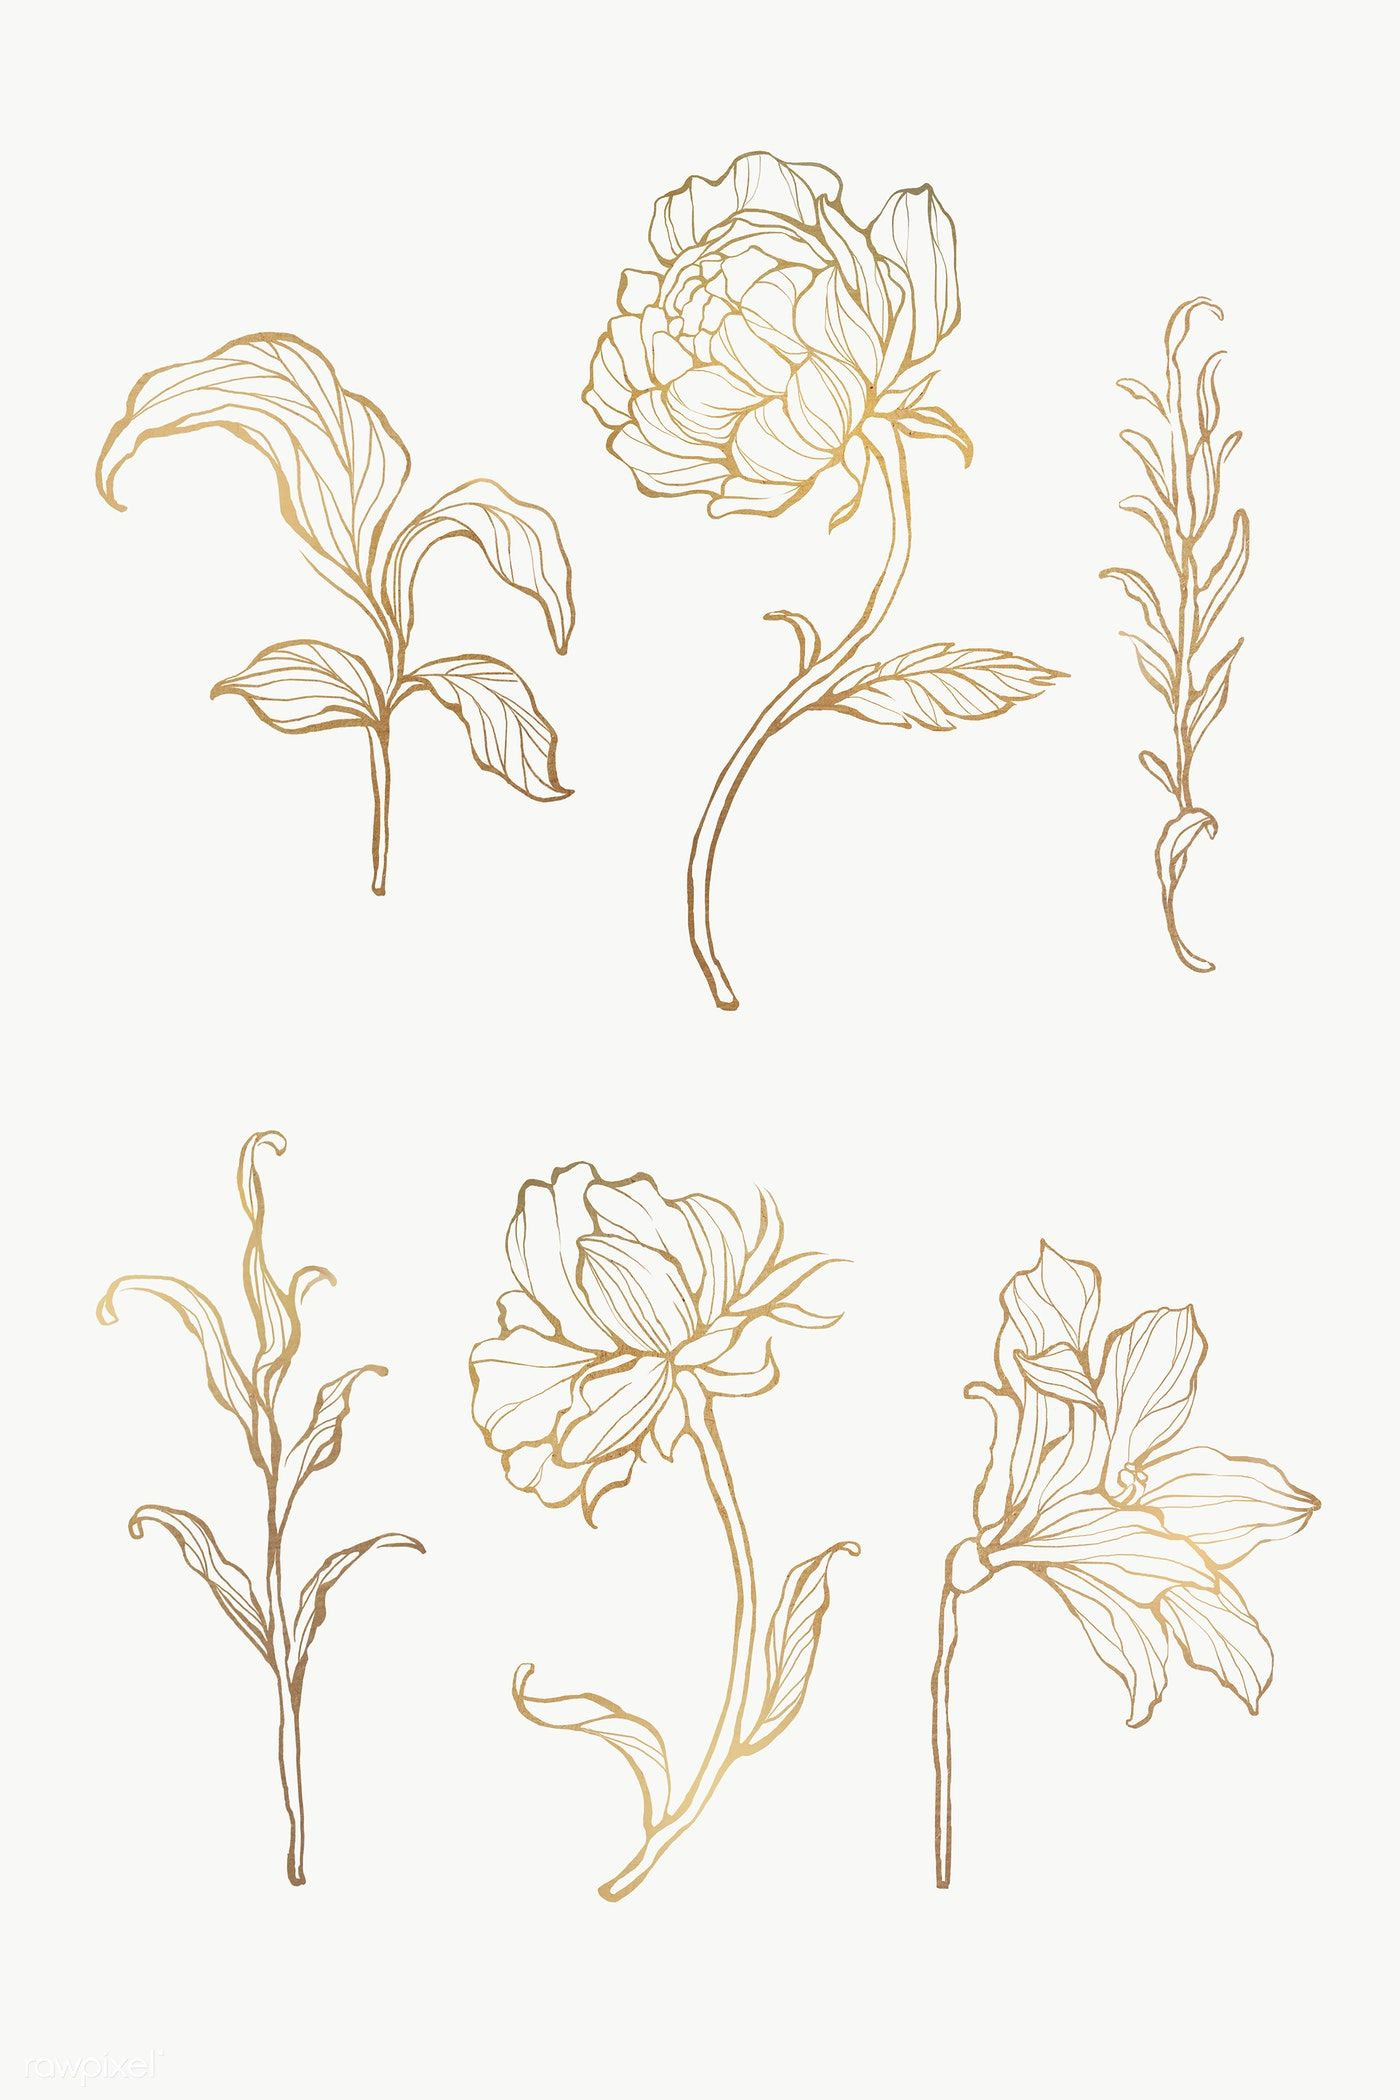 Download Premium Png Of Gold Floral Outline Set Transparent Png 2019752 Flower Drawing Gold Drawing Floral Drawing